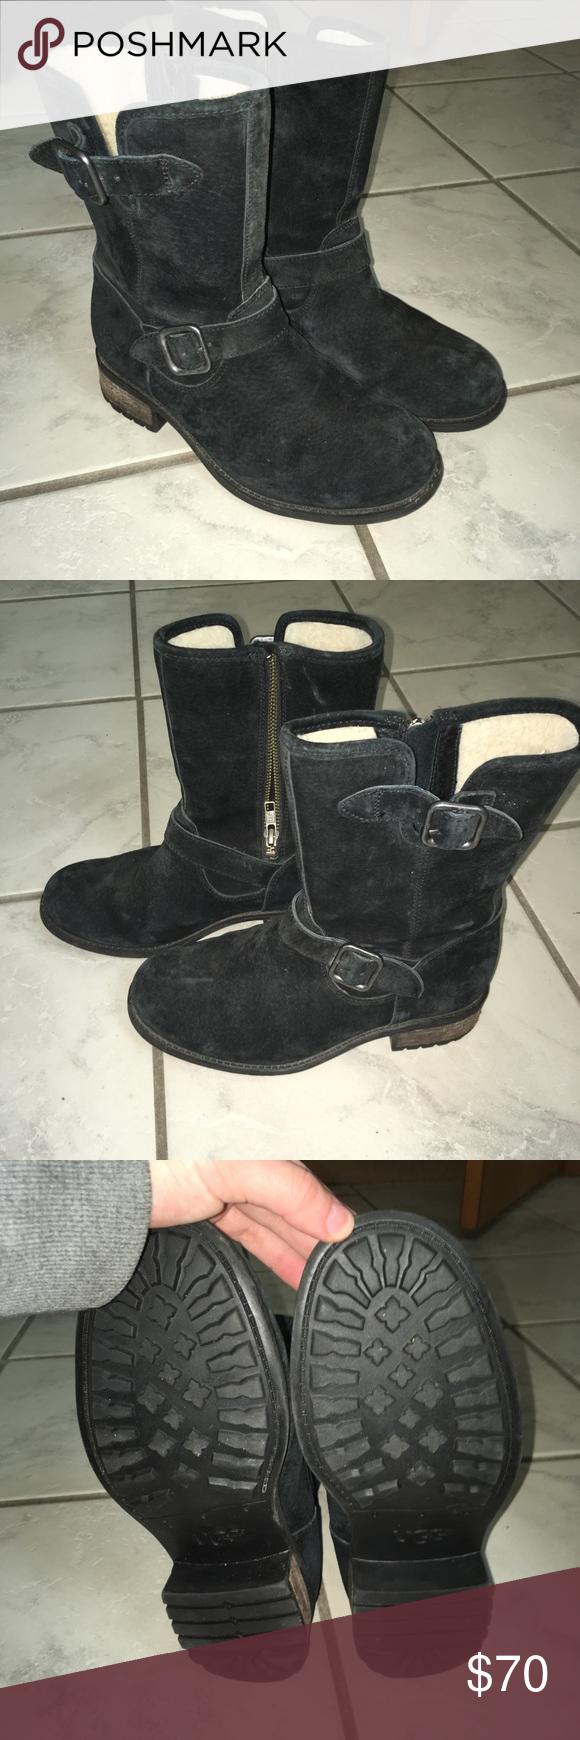 Lined suede Ugg Australia boots EUC! Hardly worn! Size 6